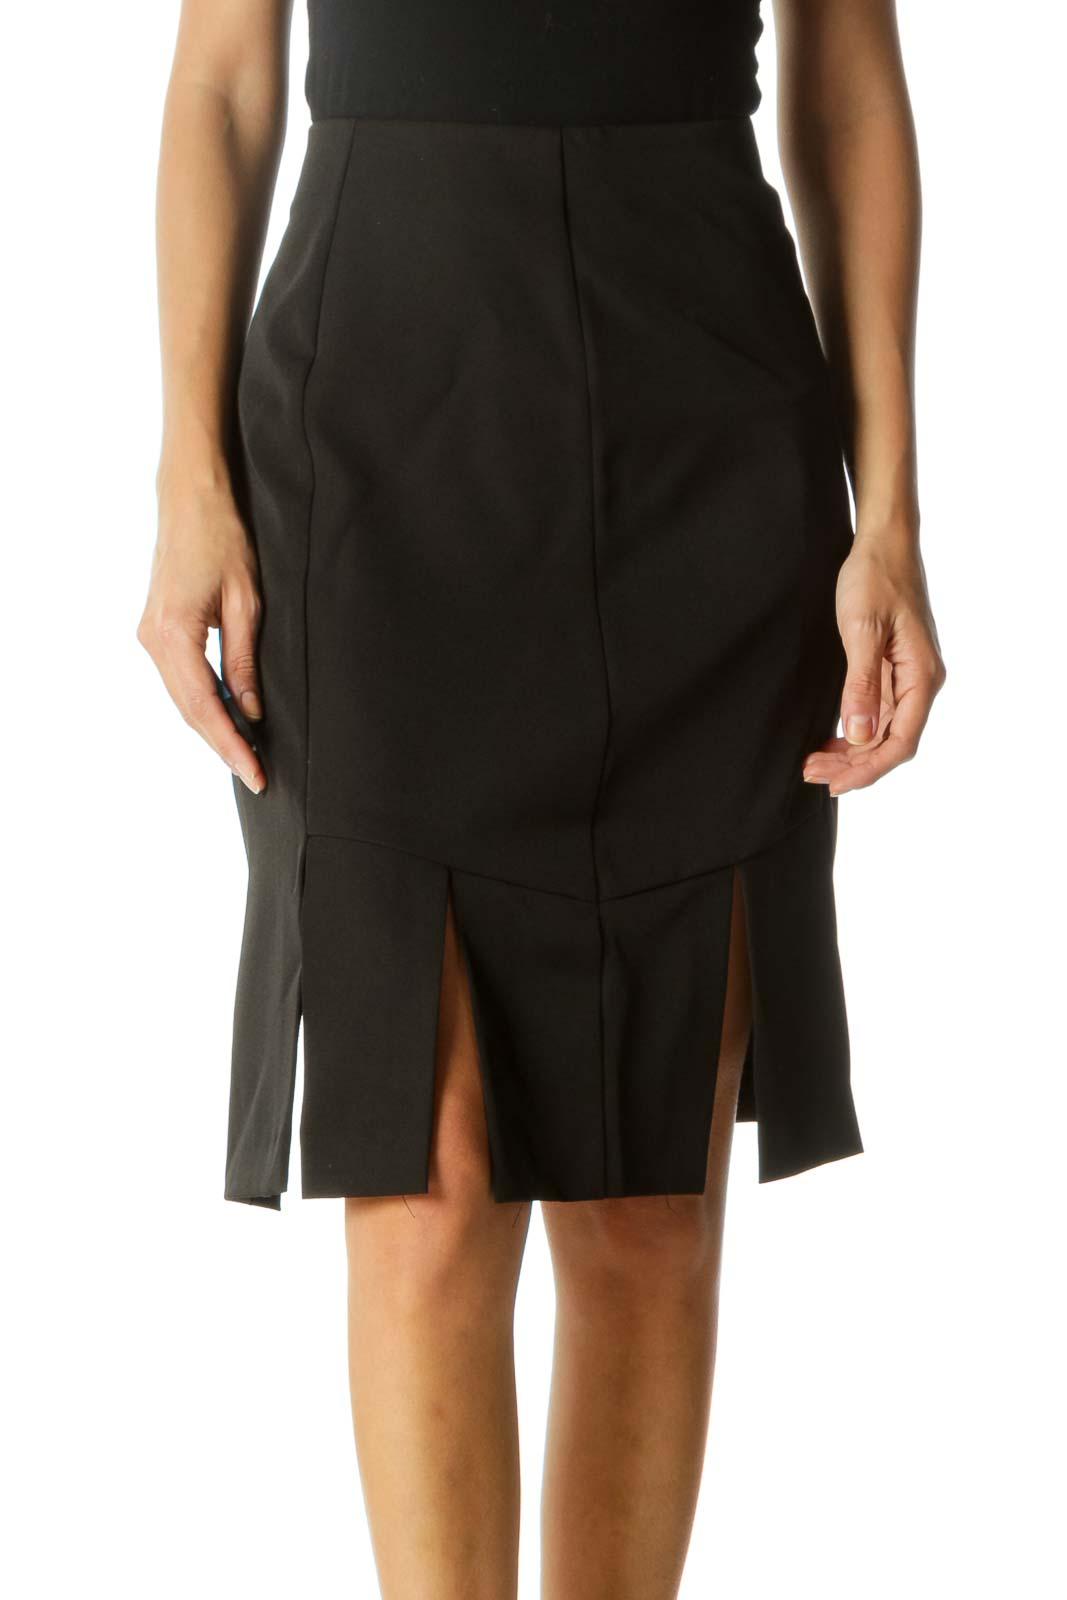 Black Zippered Cut-Out Lower Detail Skirt